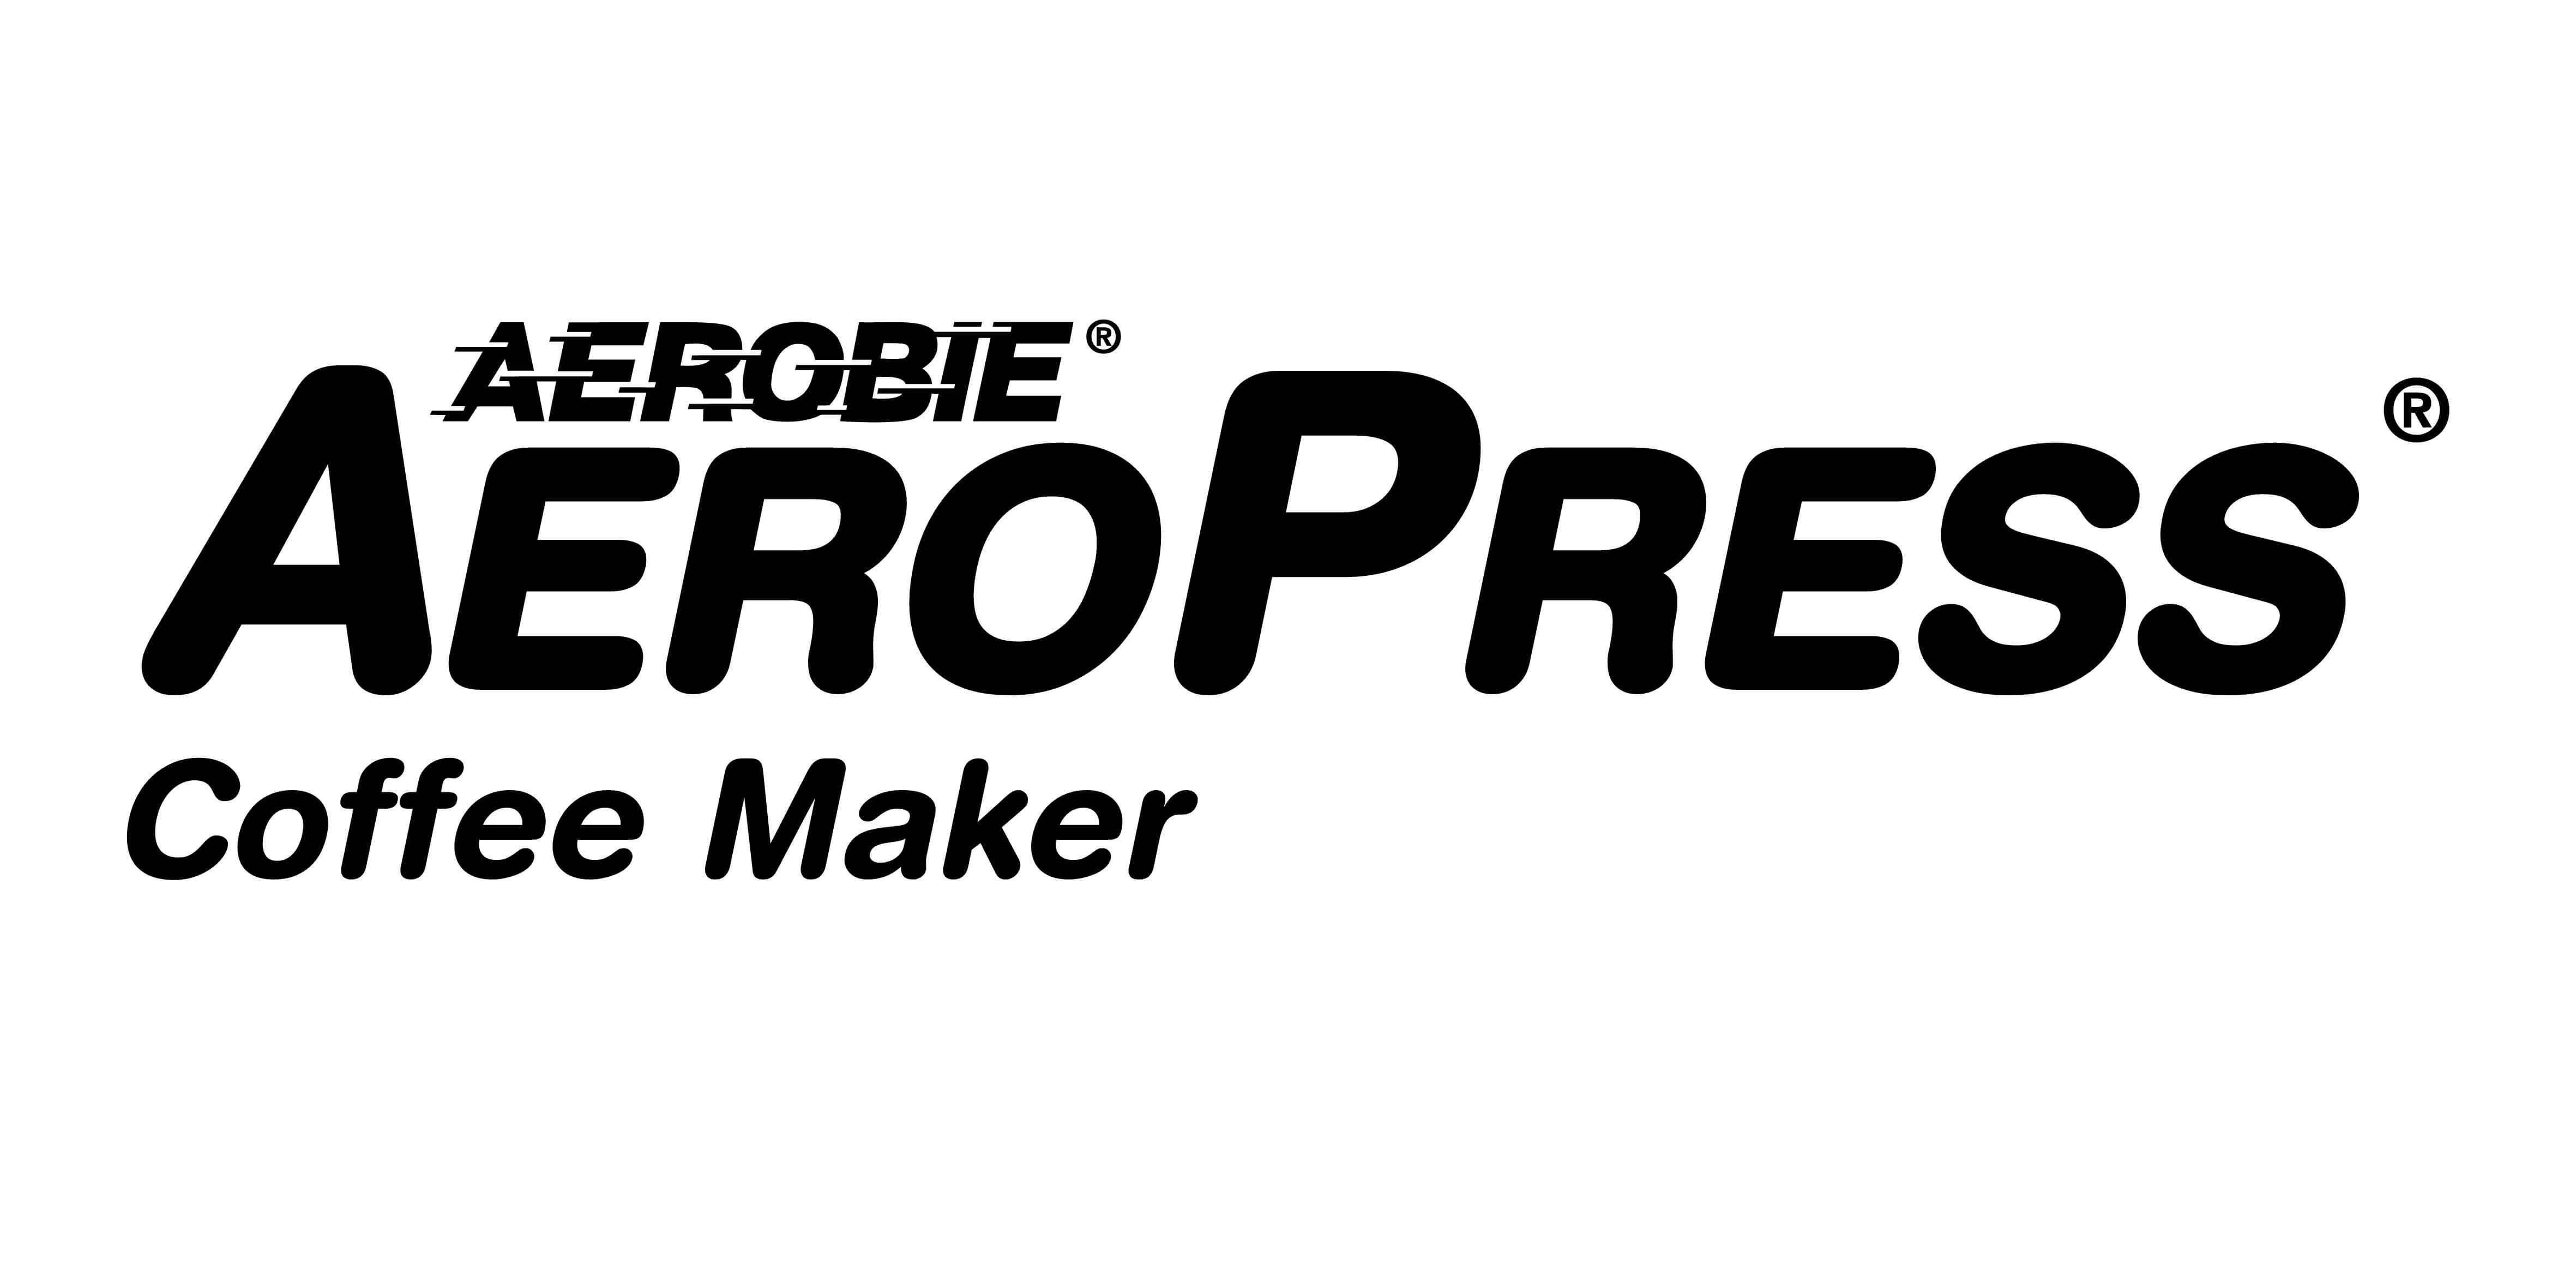 Hoe to make coffee with an Aeropress